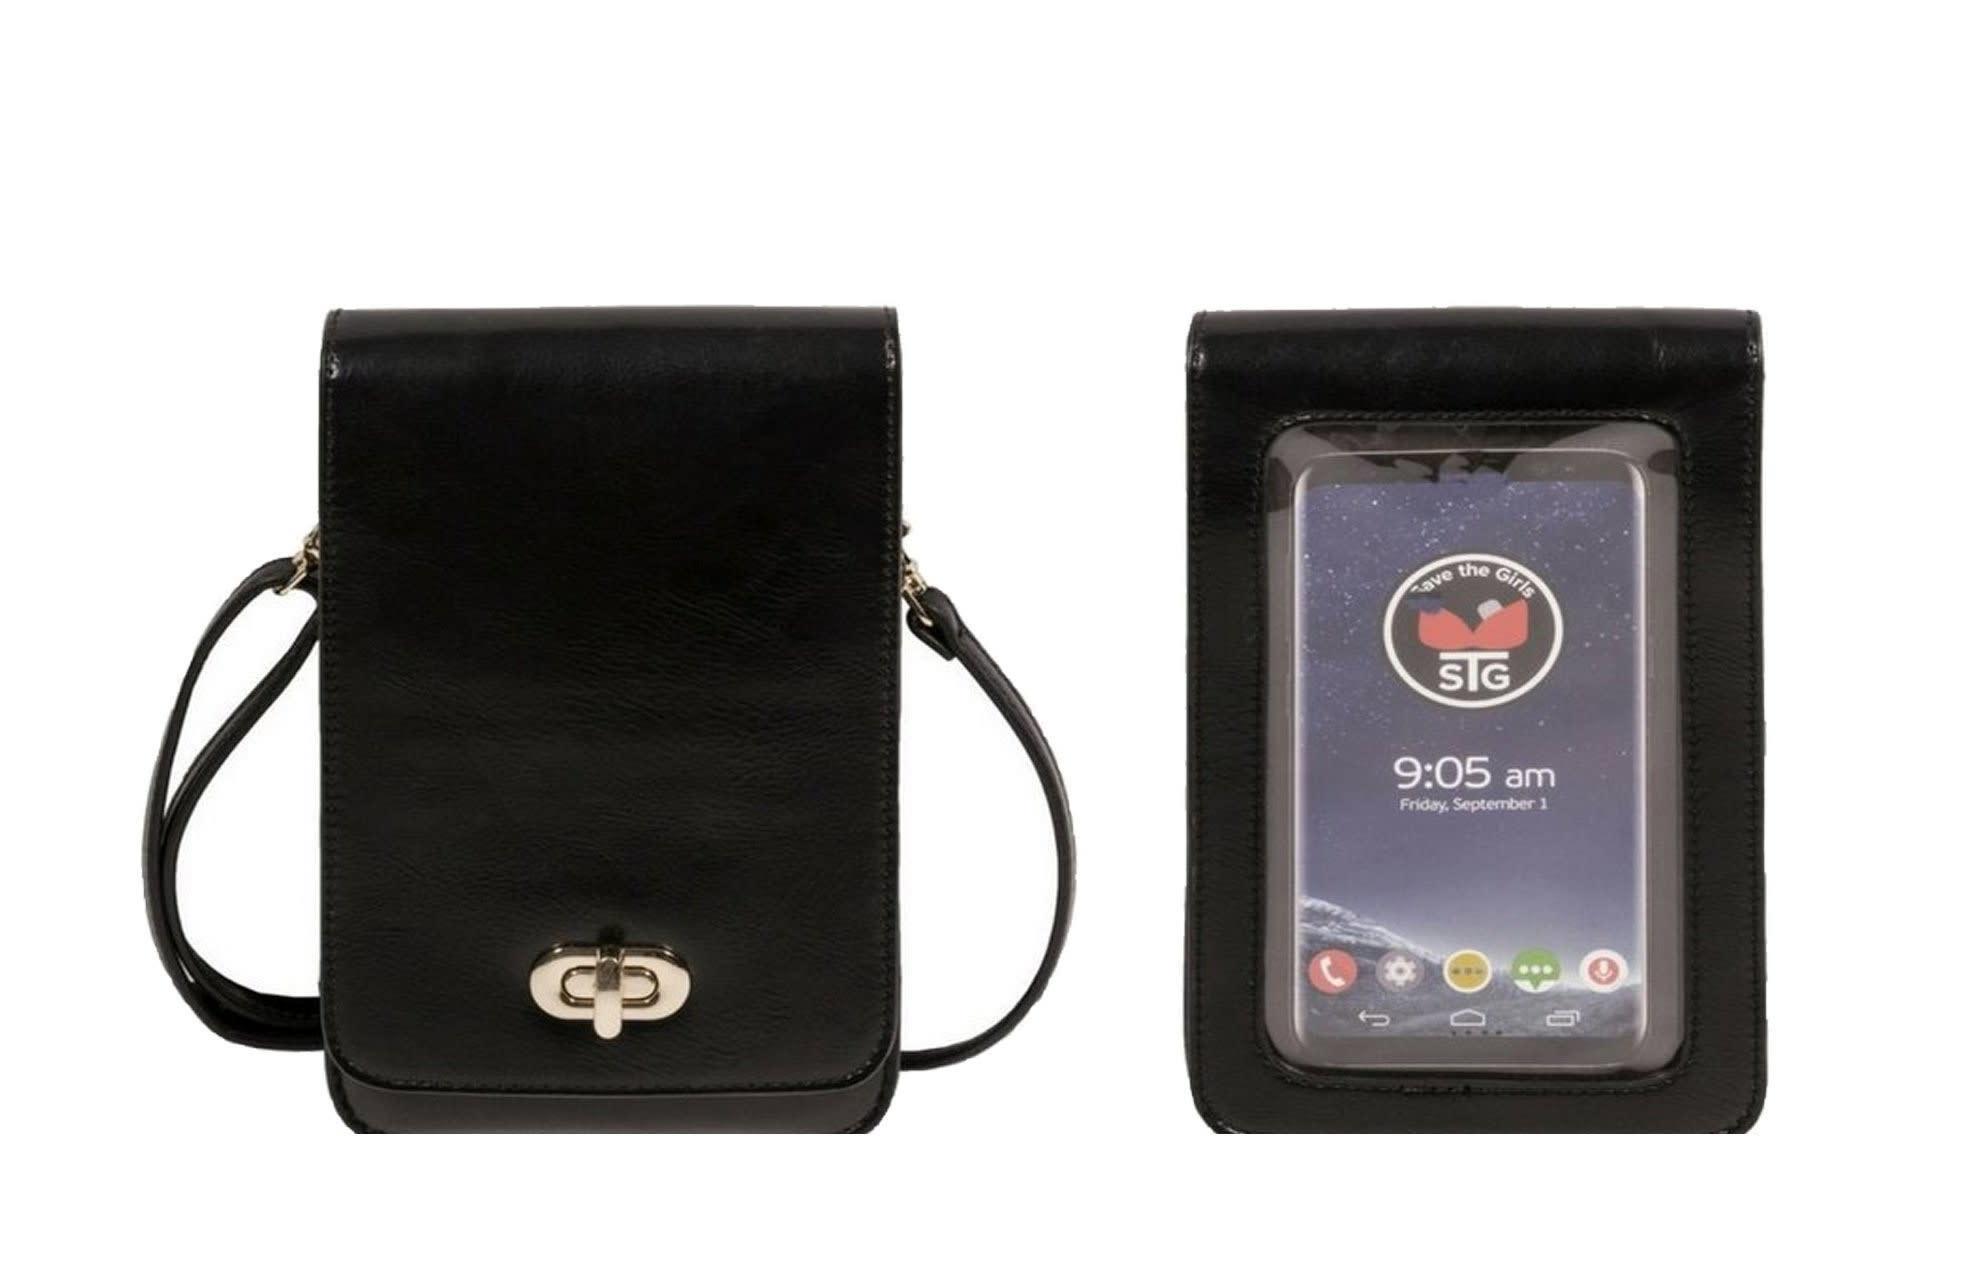 Save the Girls Black Classic Elegance (RFID) Crossbody Bag